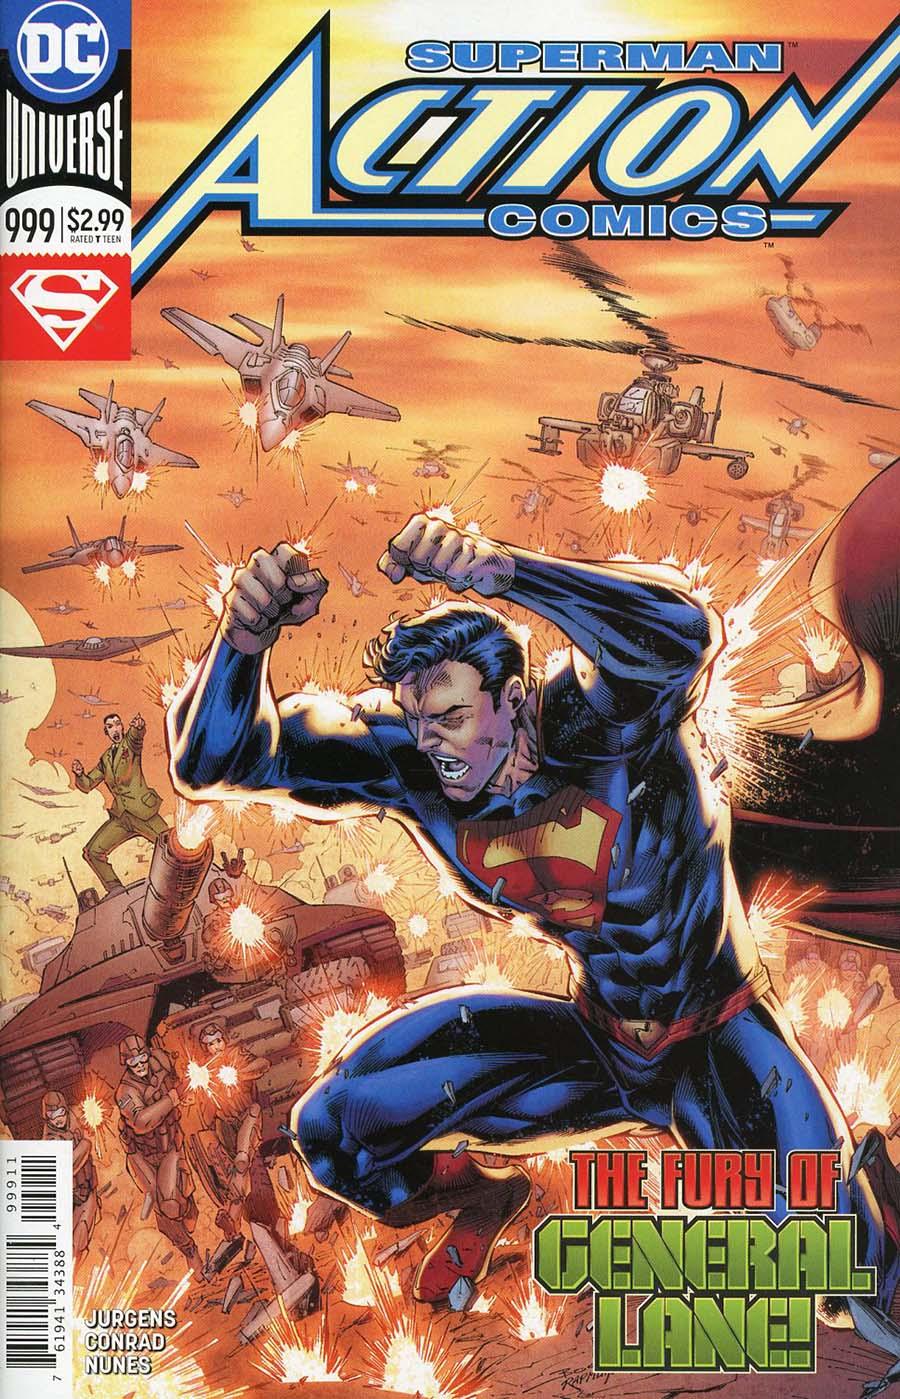 Action Comics Vol 2 #999 Cover A Regular Brett Booth & Norm Rapmund Cover